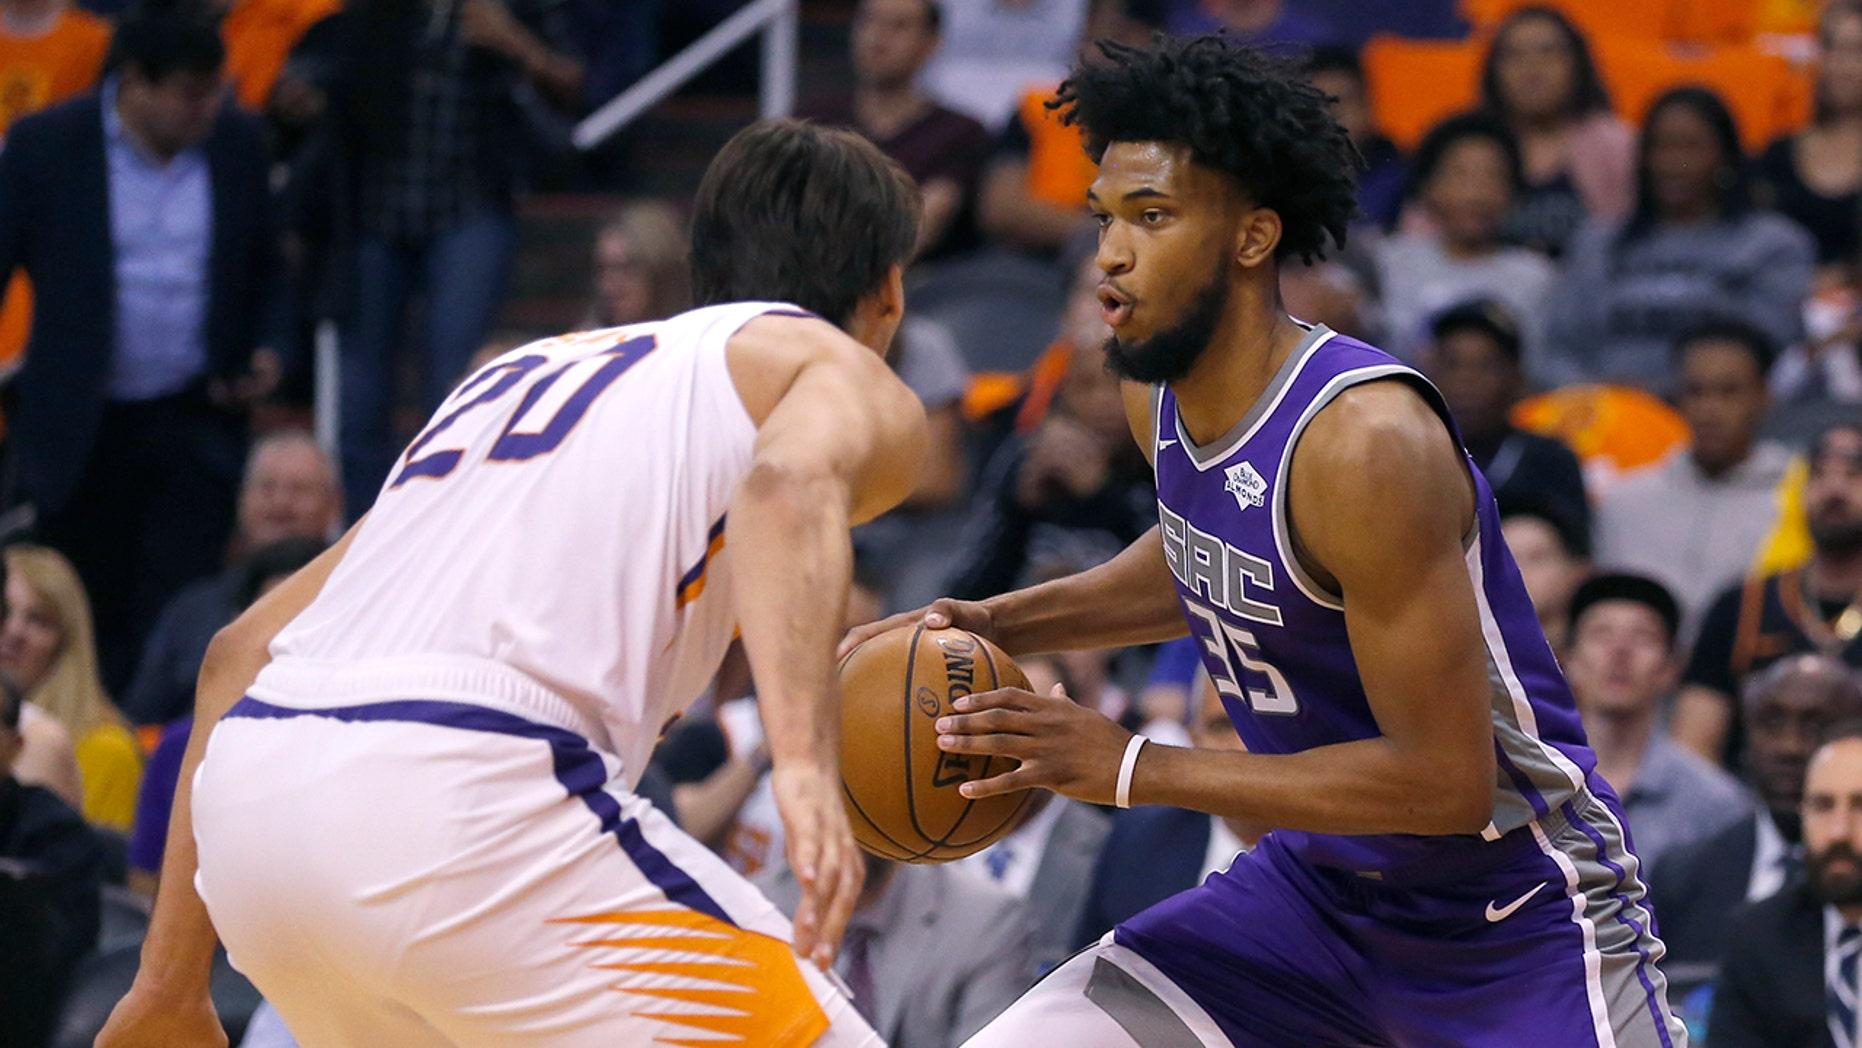 Sacramento Kings forward Marvin Bagley III drives on Phoenix Suns forward Dario Saric (20) during the first half of an NBA basketball game Wednesday, Oct. 23, 2019, in Phoenix. (AP Photo/Rick Scuteri)